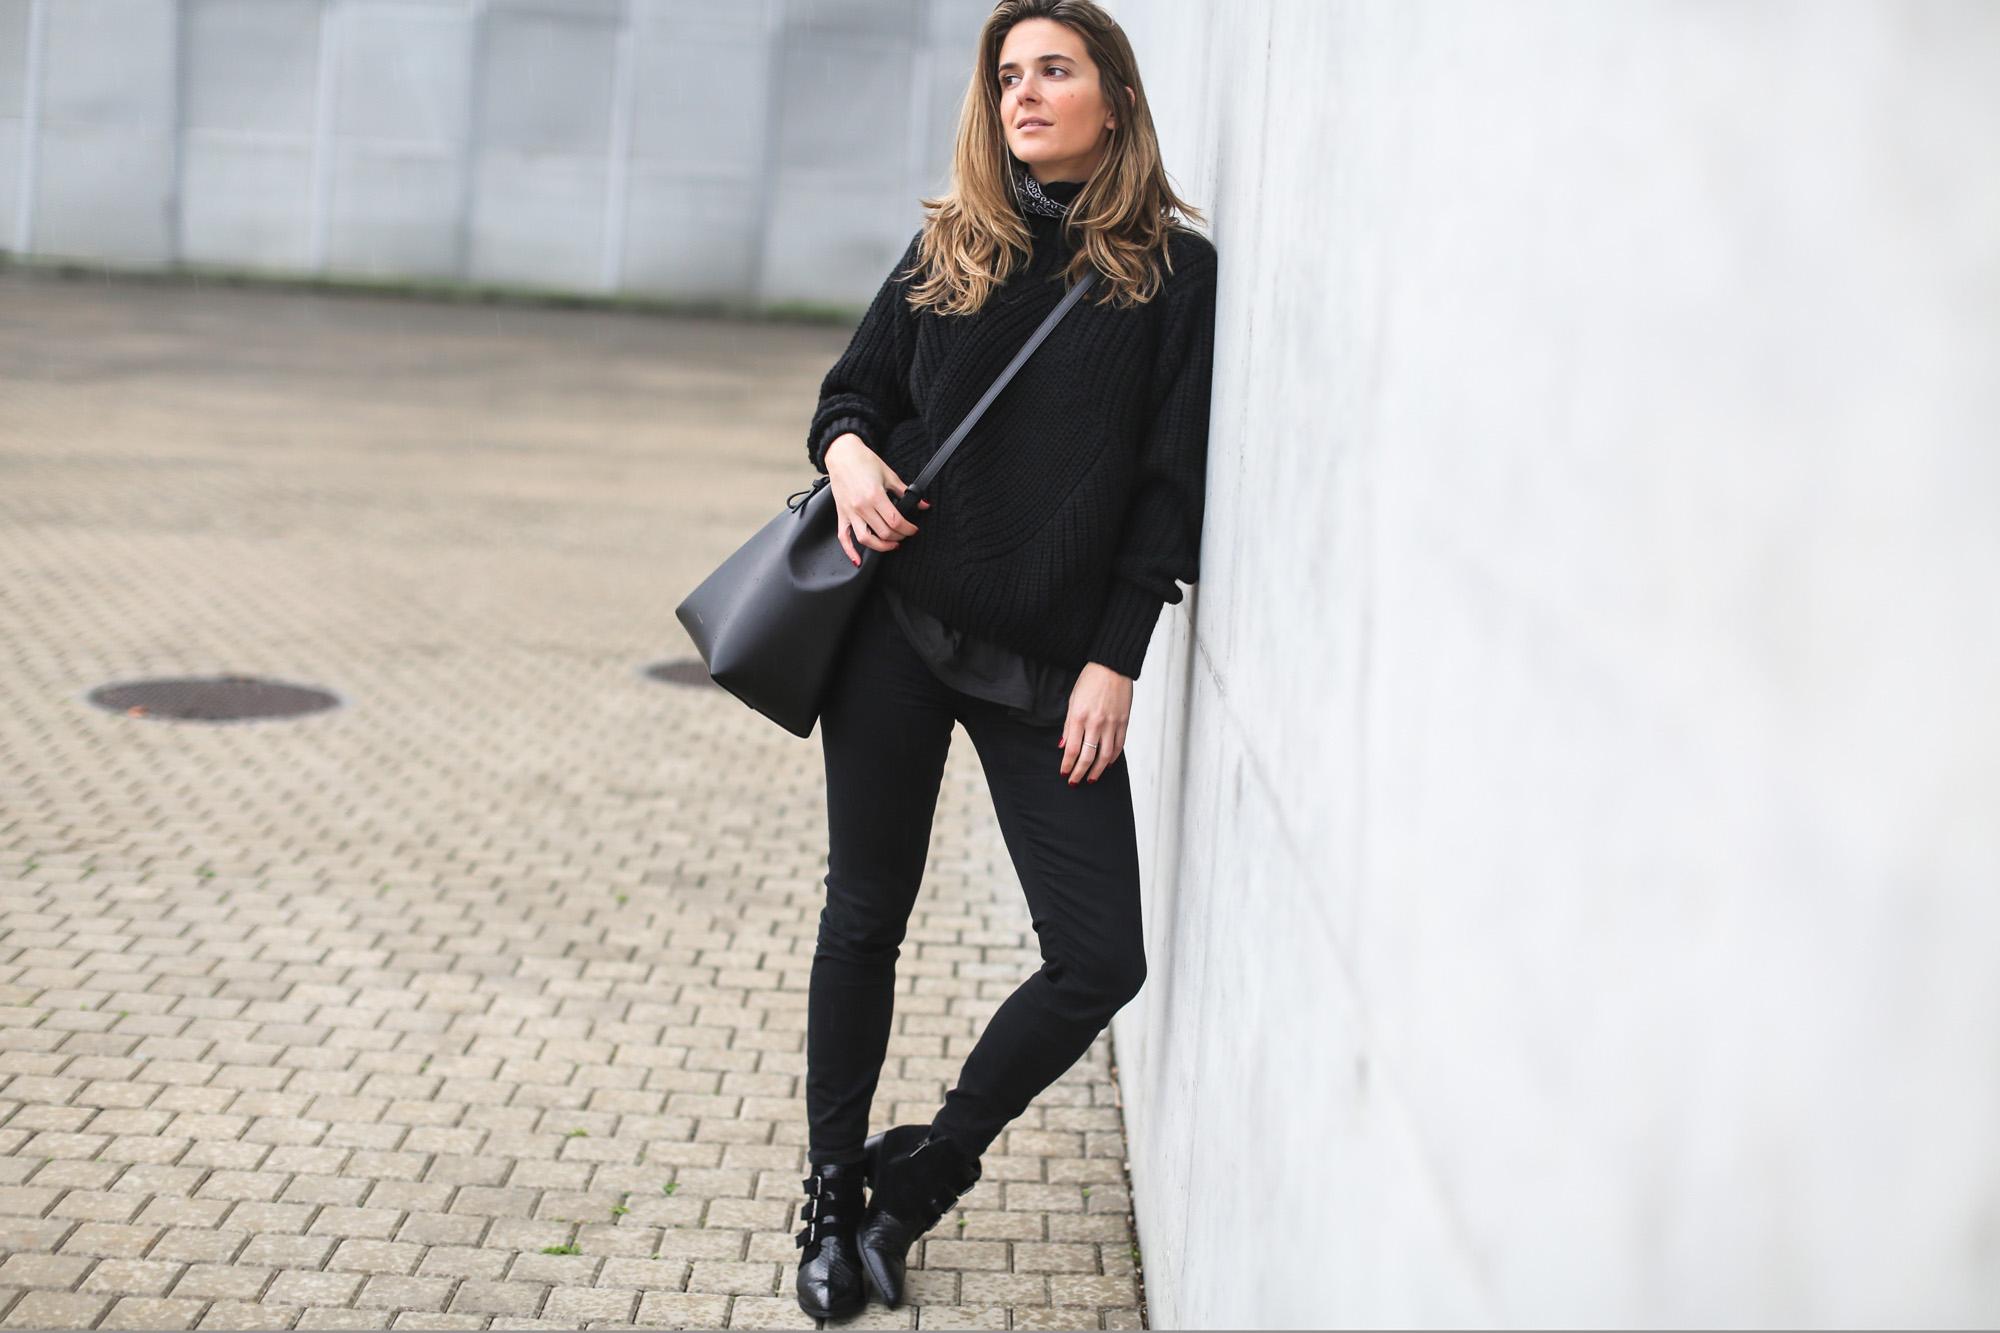 Clochet_streetstyle_RevolveClothing_Raye_kelsi_ankleboots-8